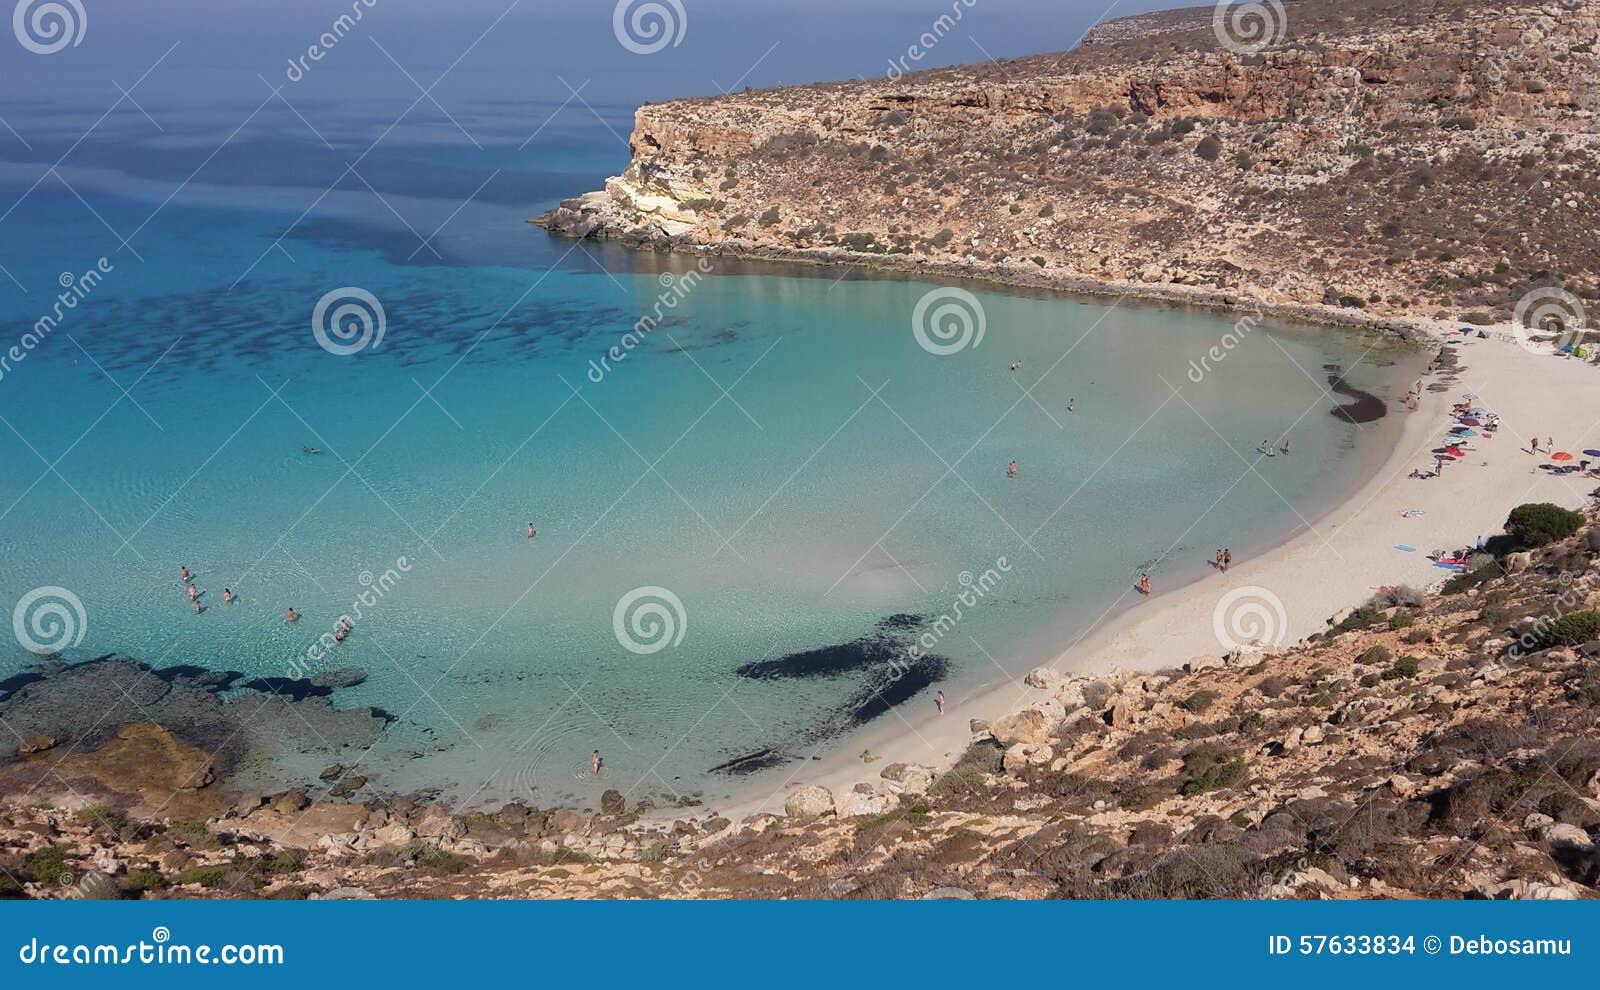 Isola-dei conigli Lampedusa Italien